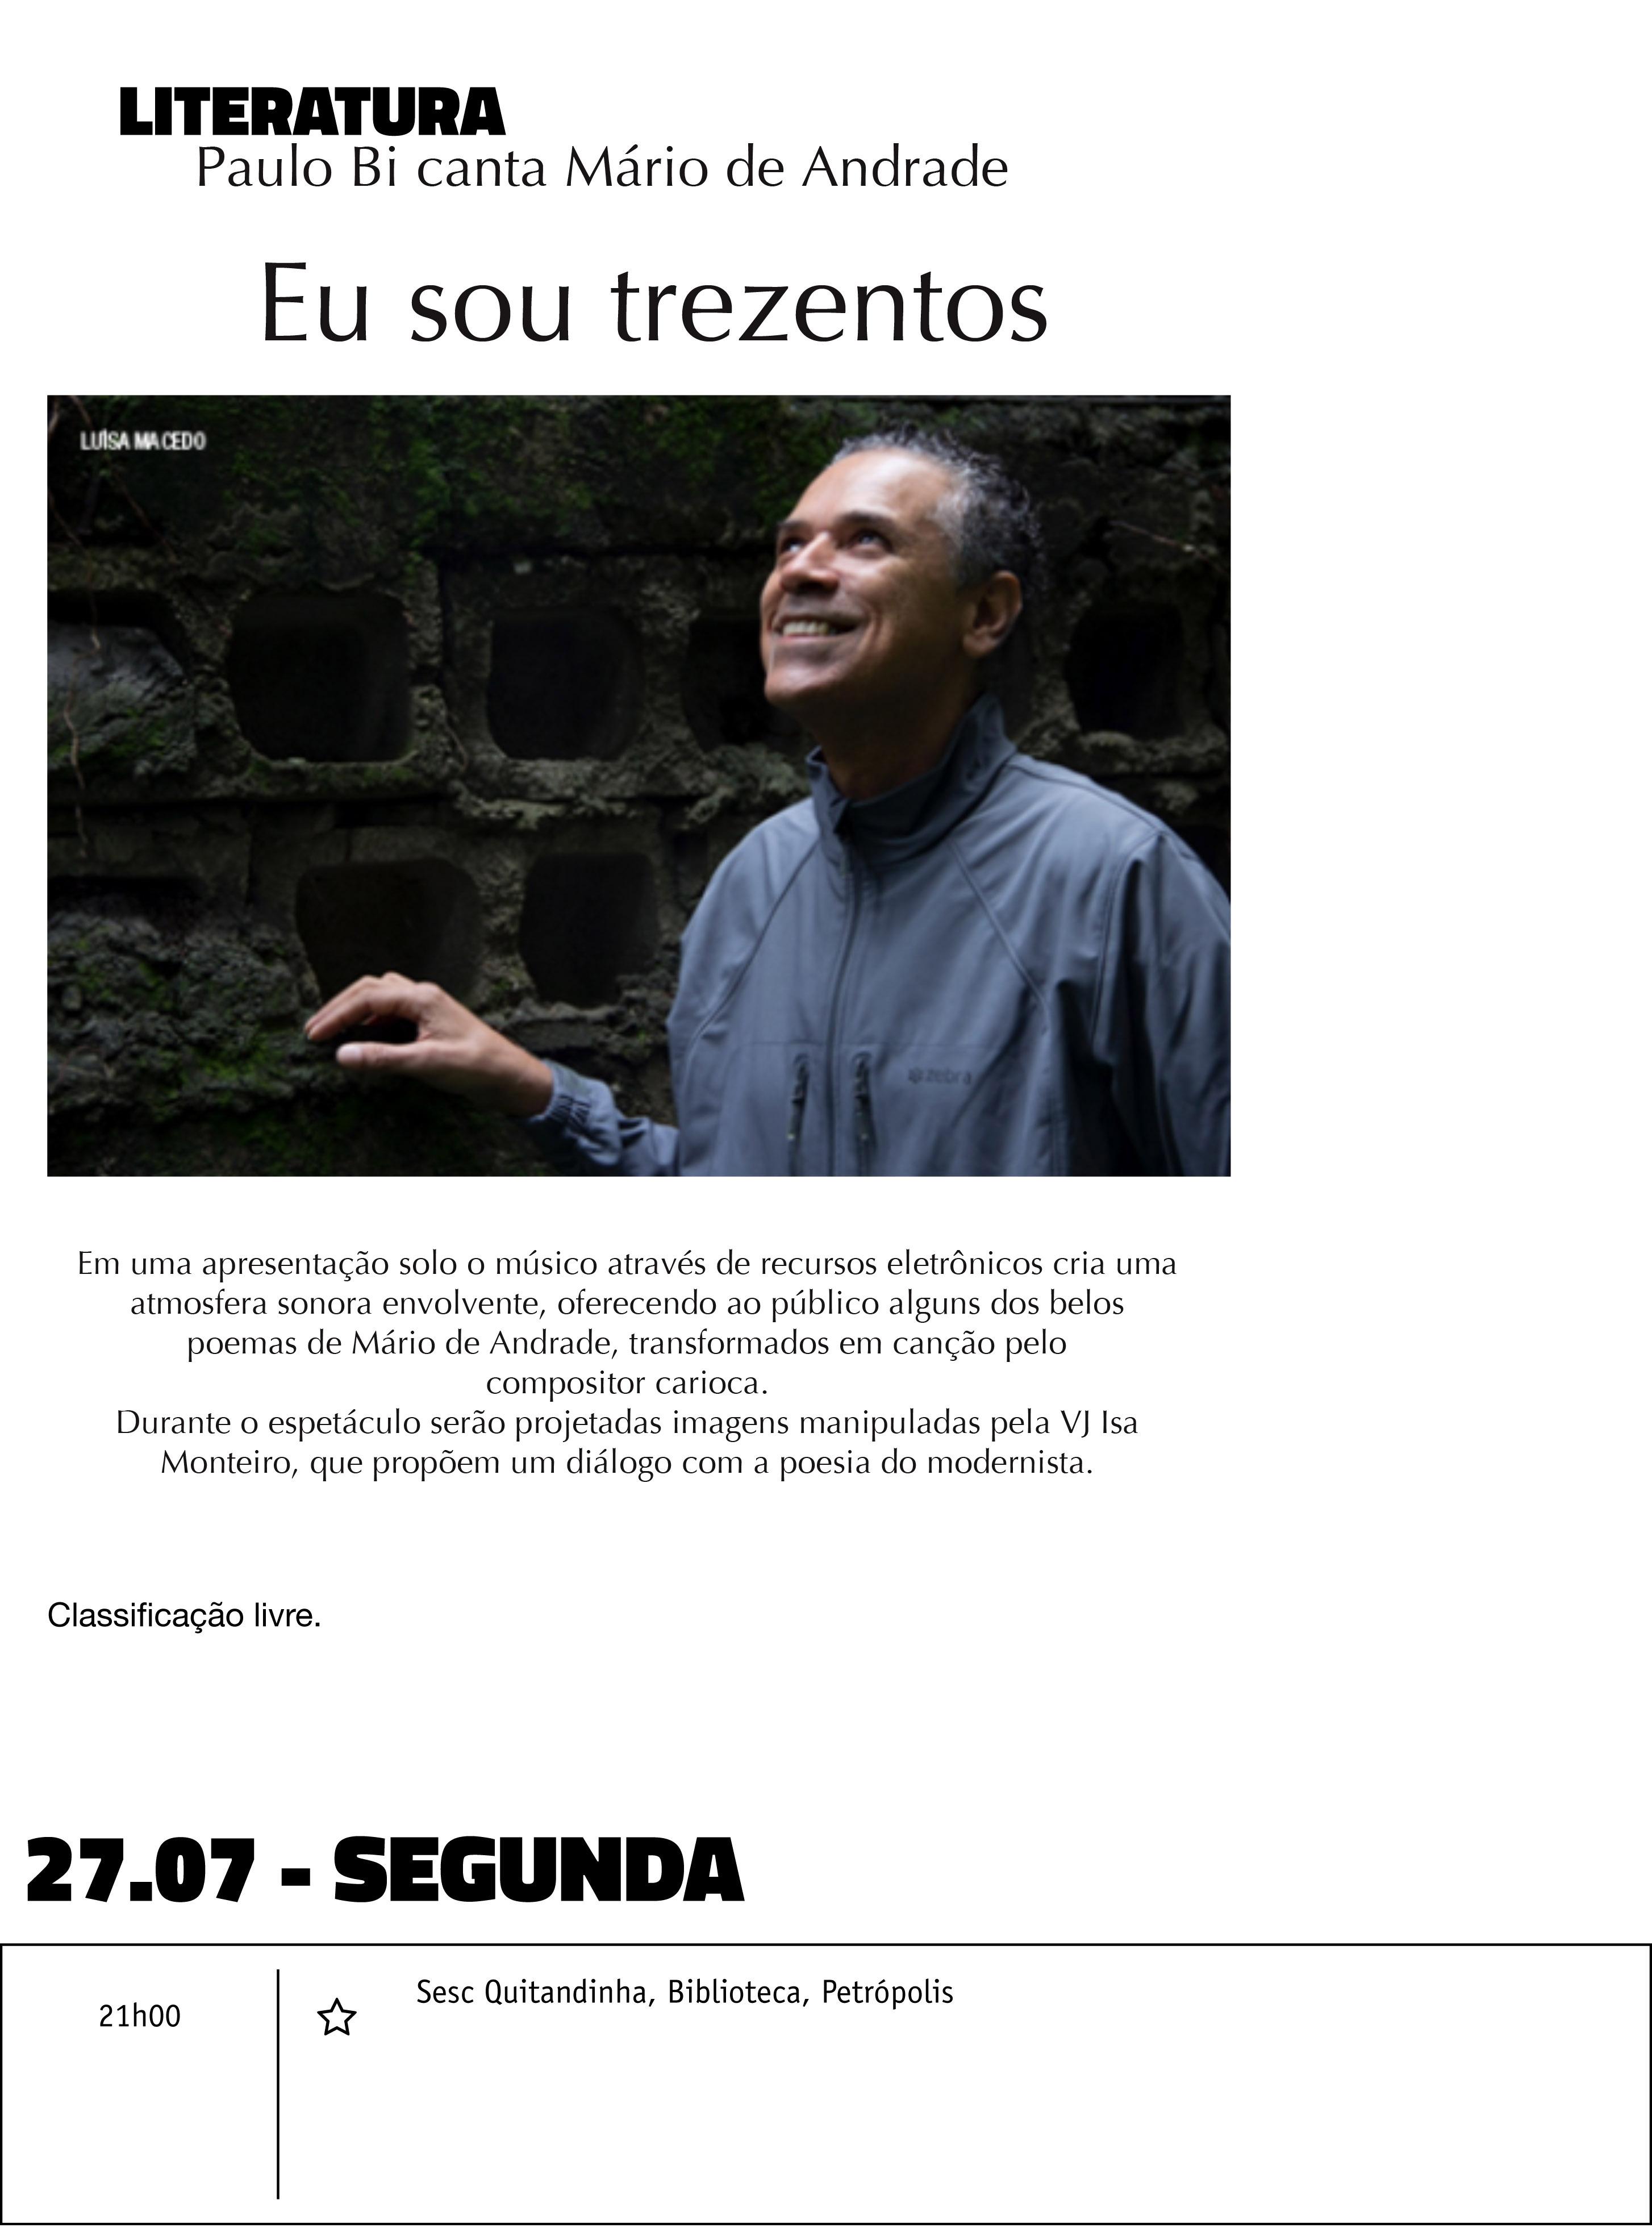 Sesc Quitandinha